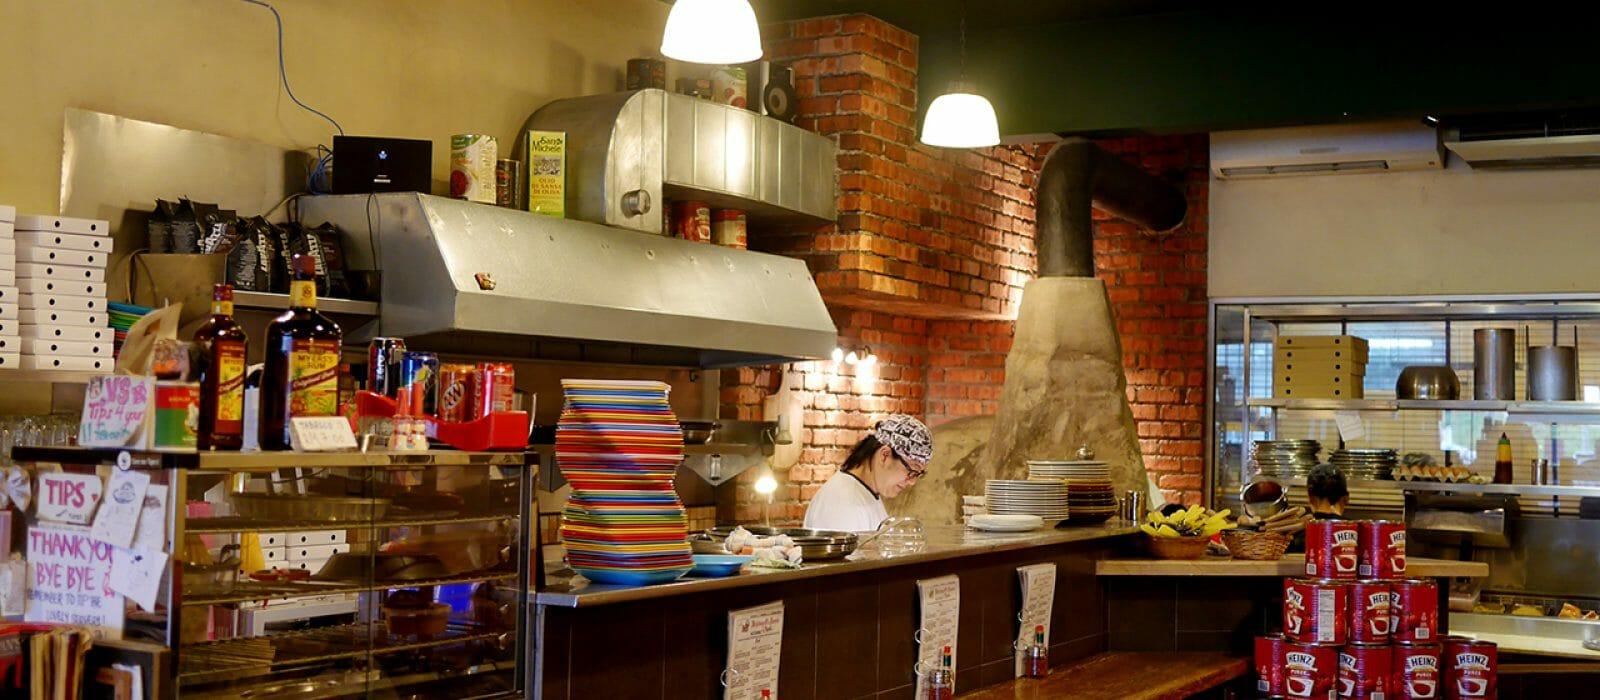 Michelangelo's Pizzeria, Ipoh